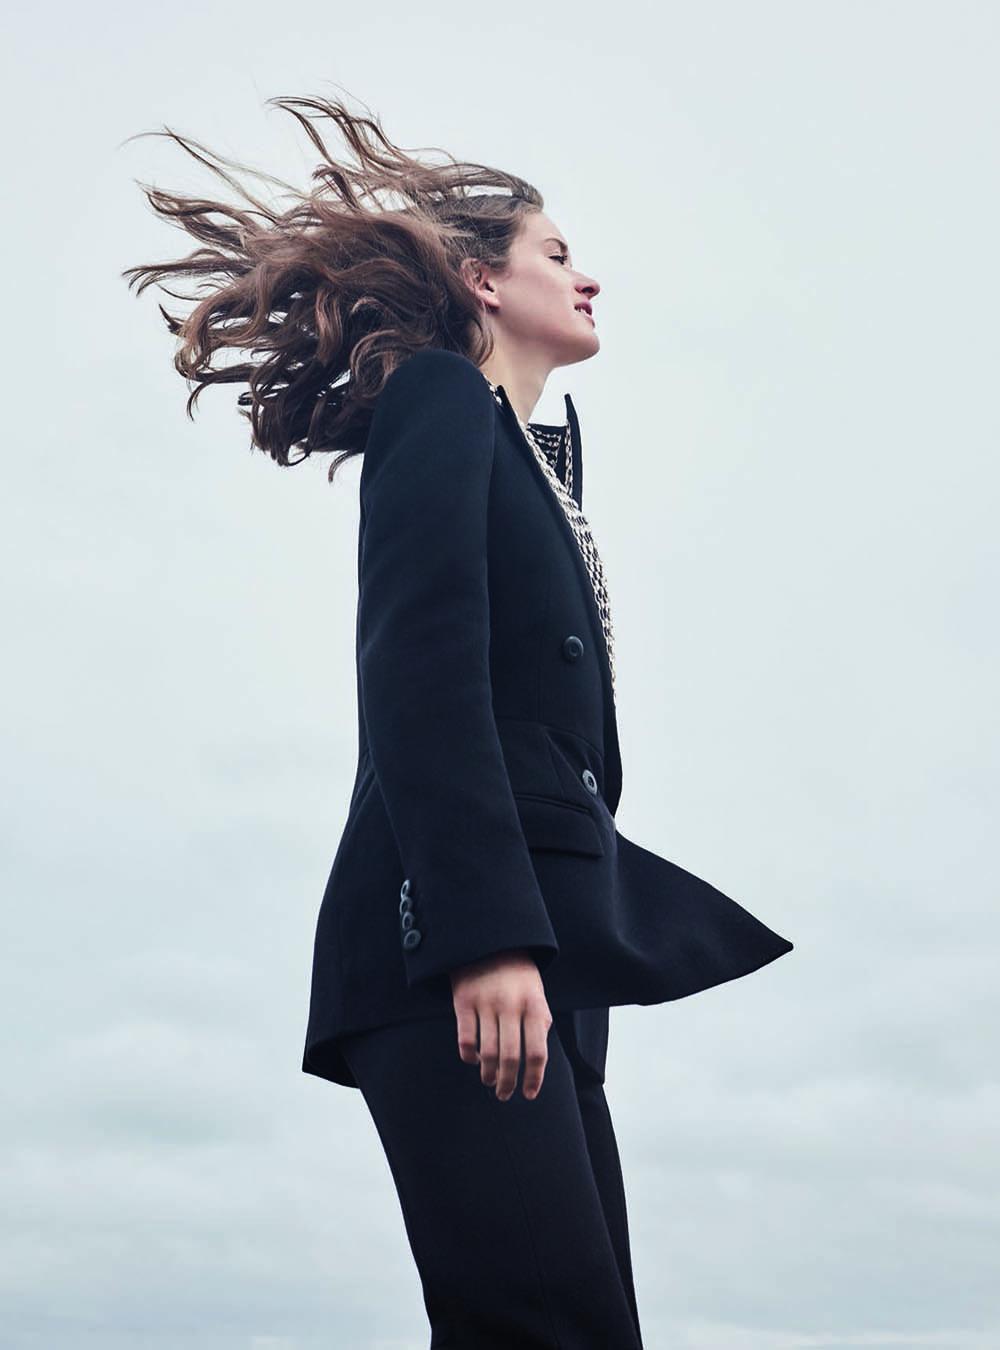 Femke Huijzer by Agata Pospieszynska for Harper's Bazaar UK September 2019